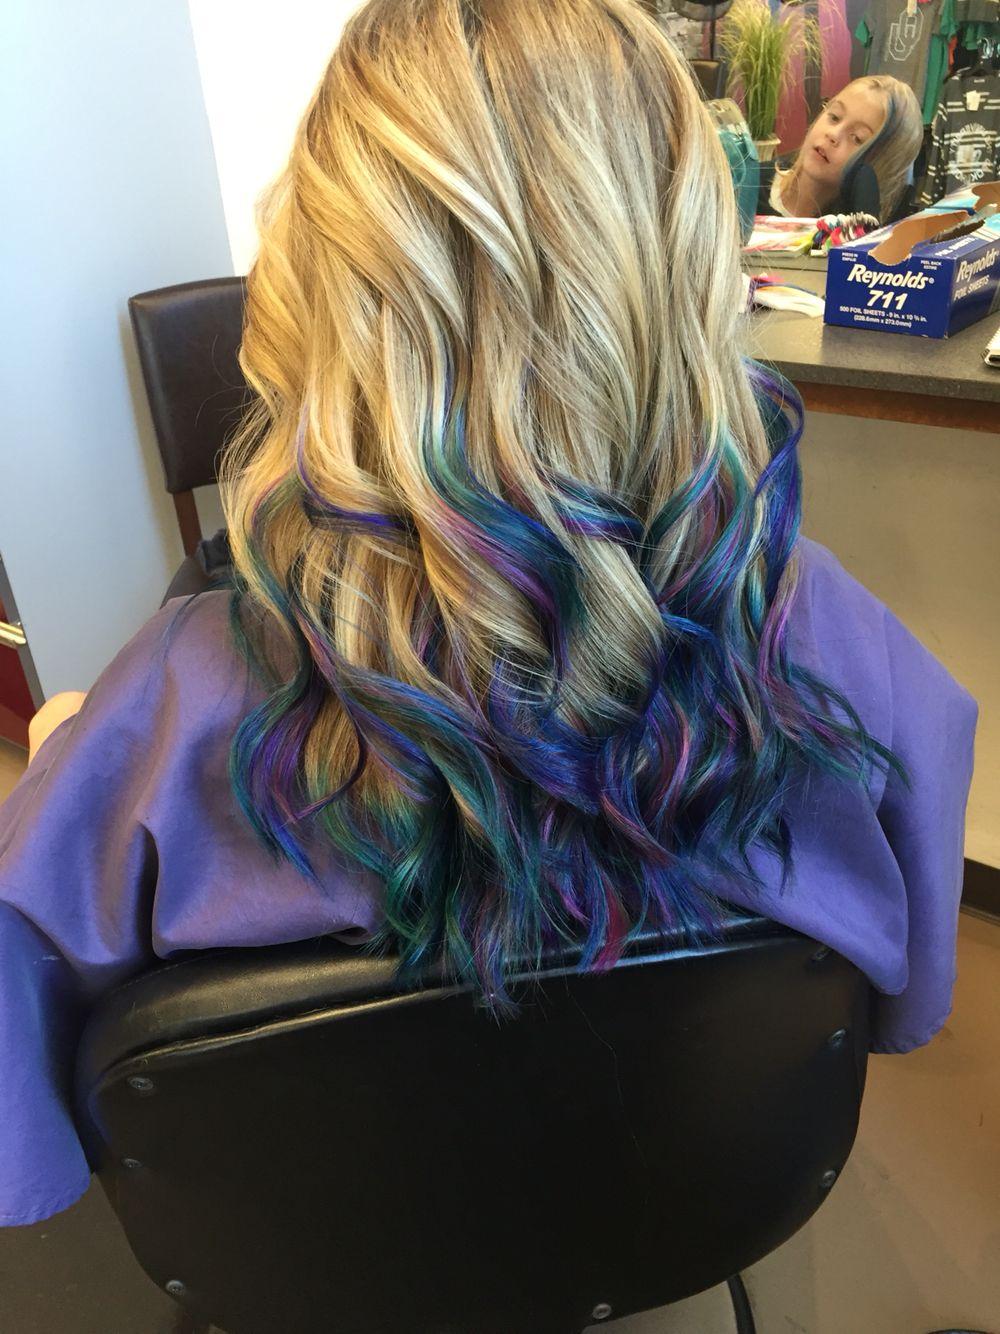 Oil Slick Tips On Blonde Hair My Style In 2018 Pinterest Hair